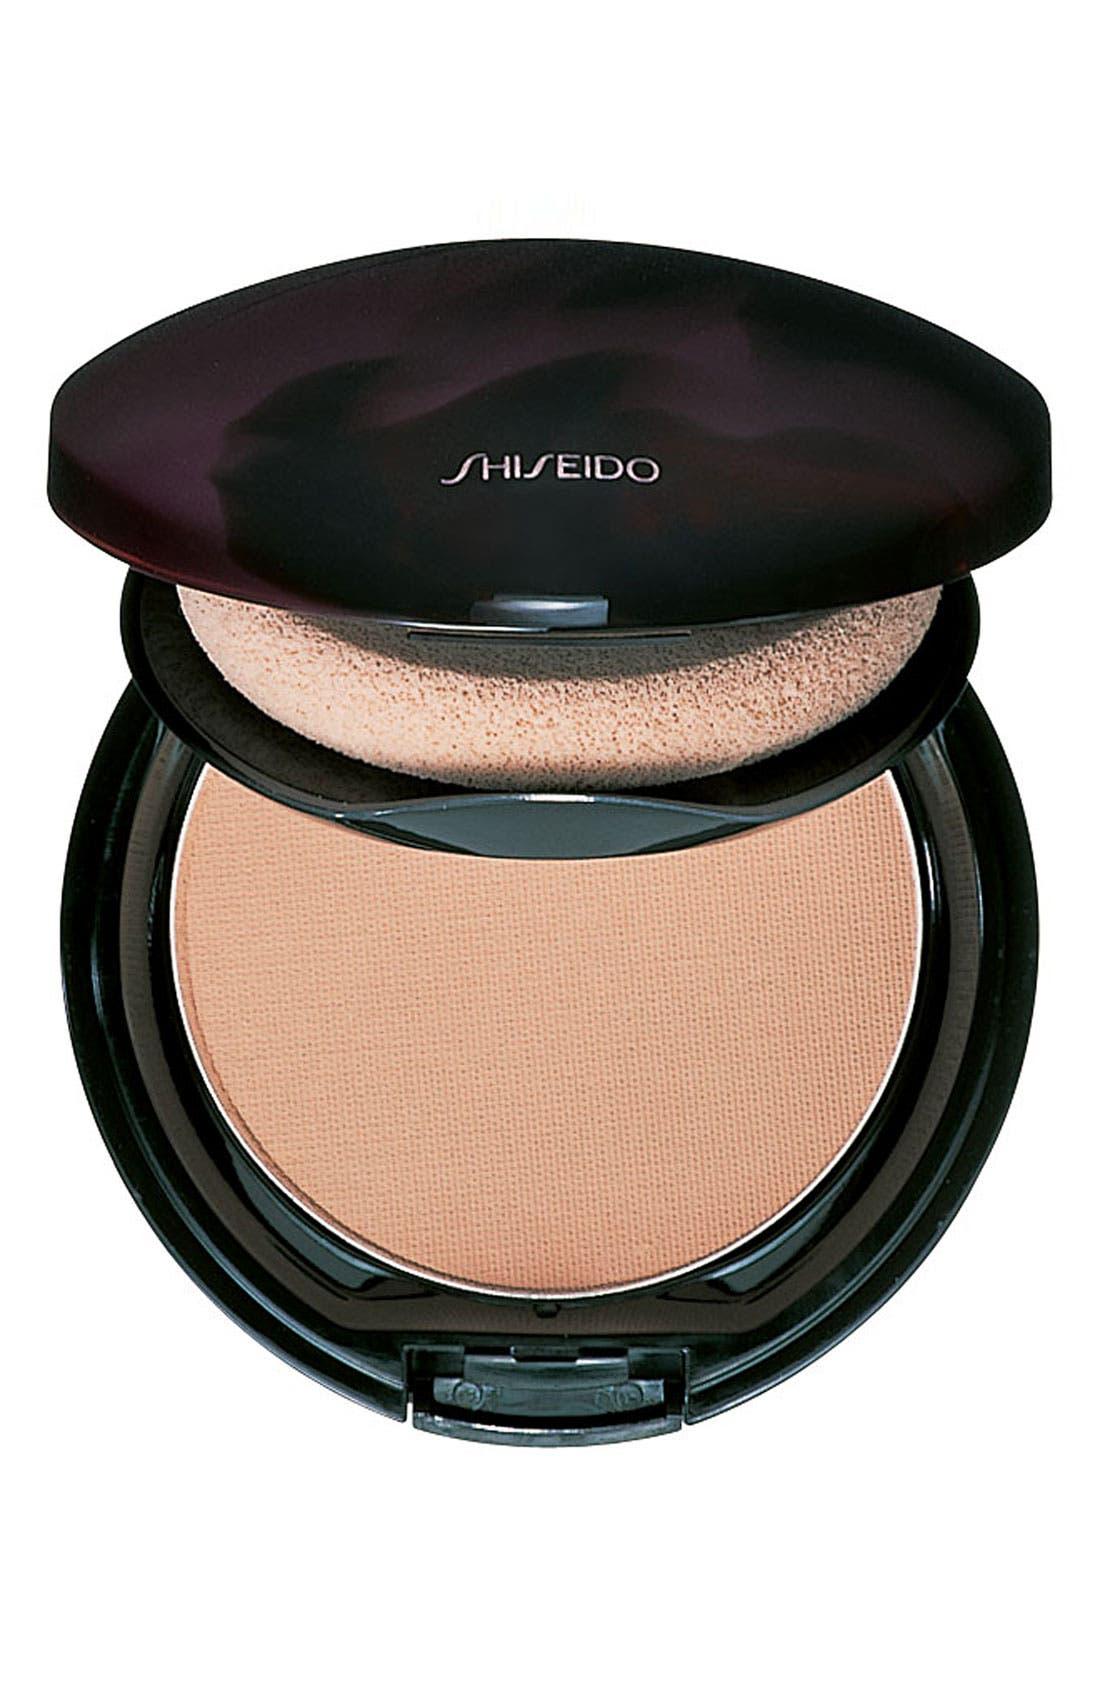 Shiseido Powdery Foundation Refill SPF 14